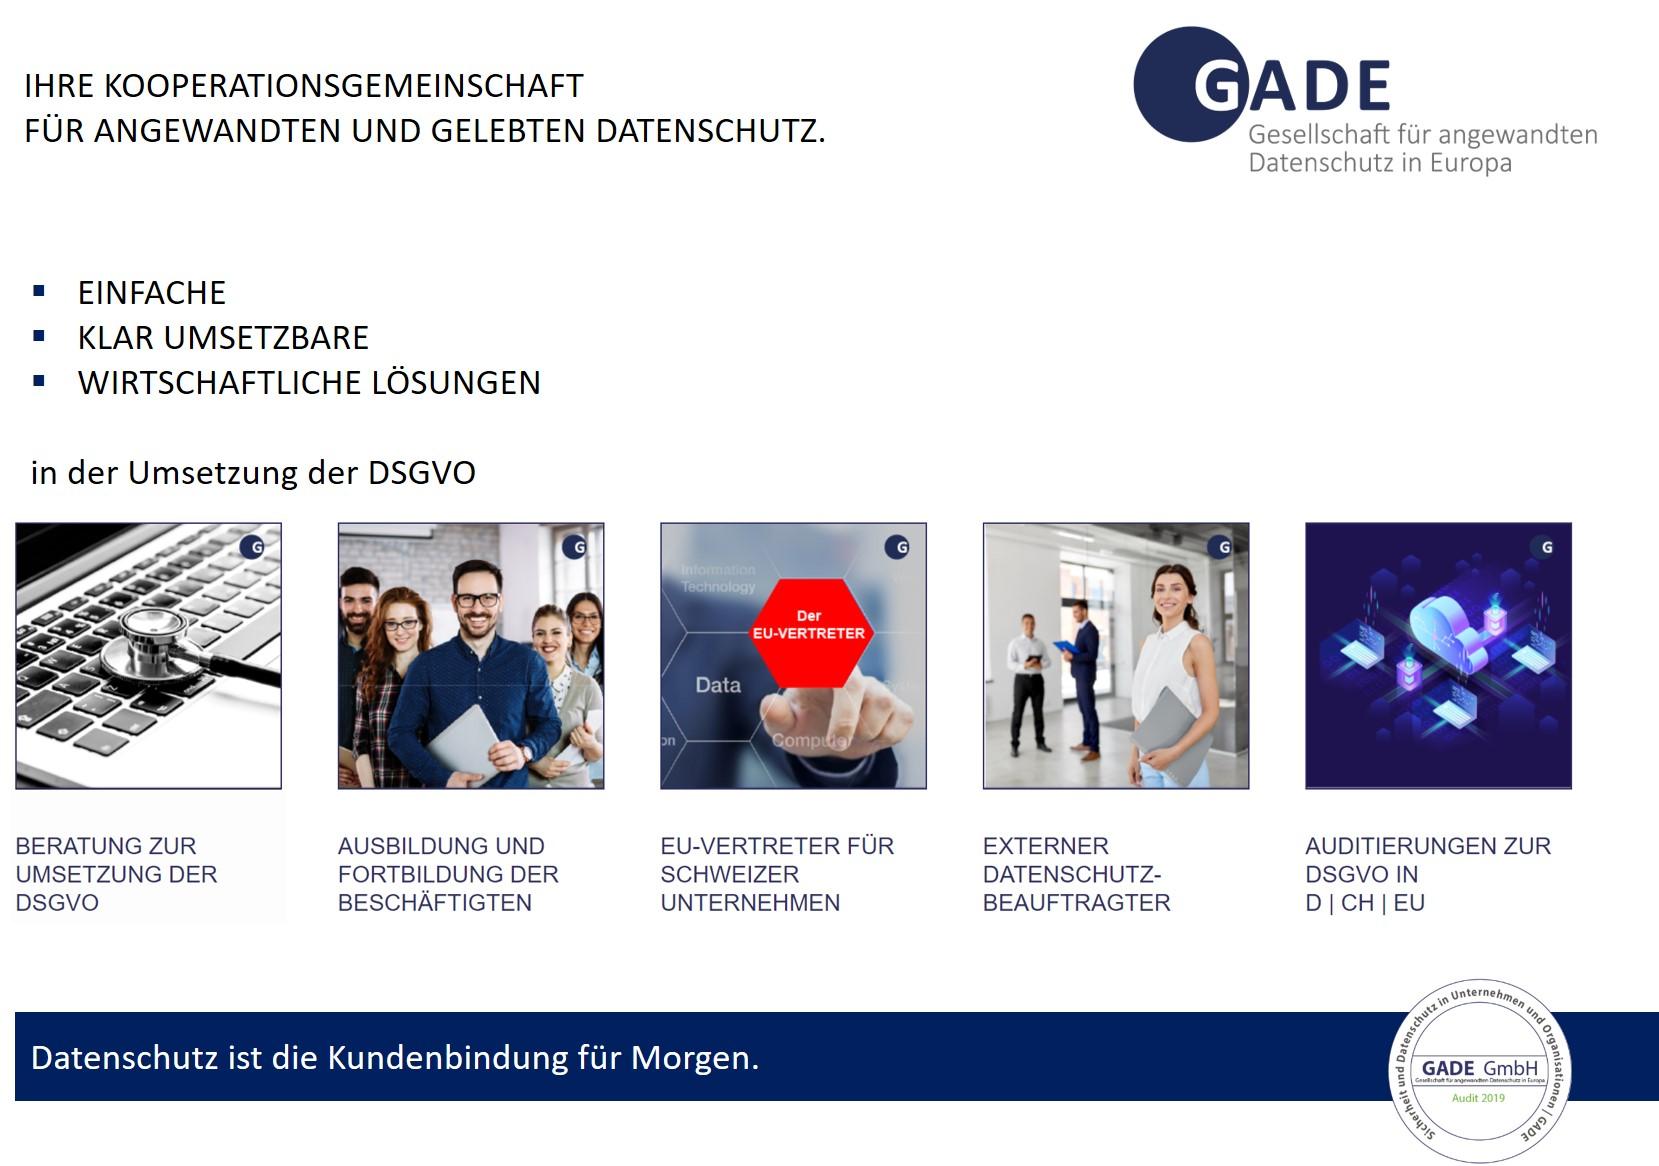 GADE GmbH